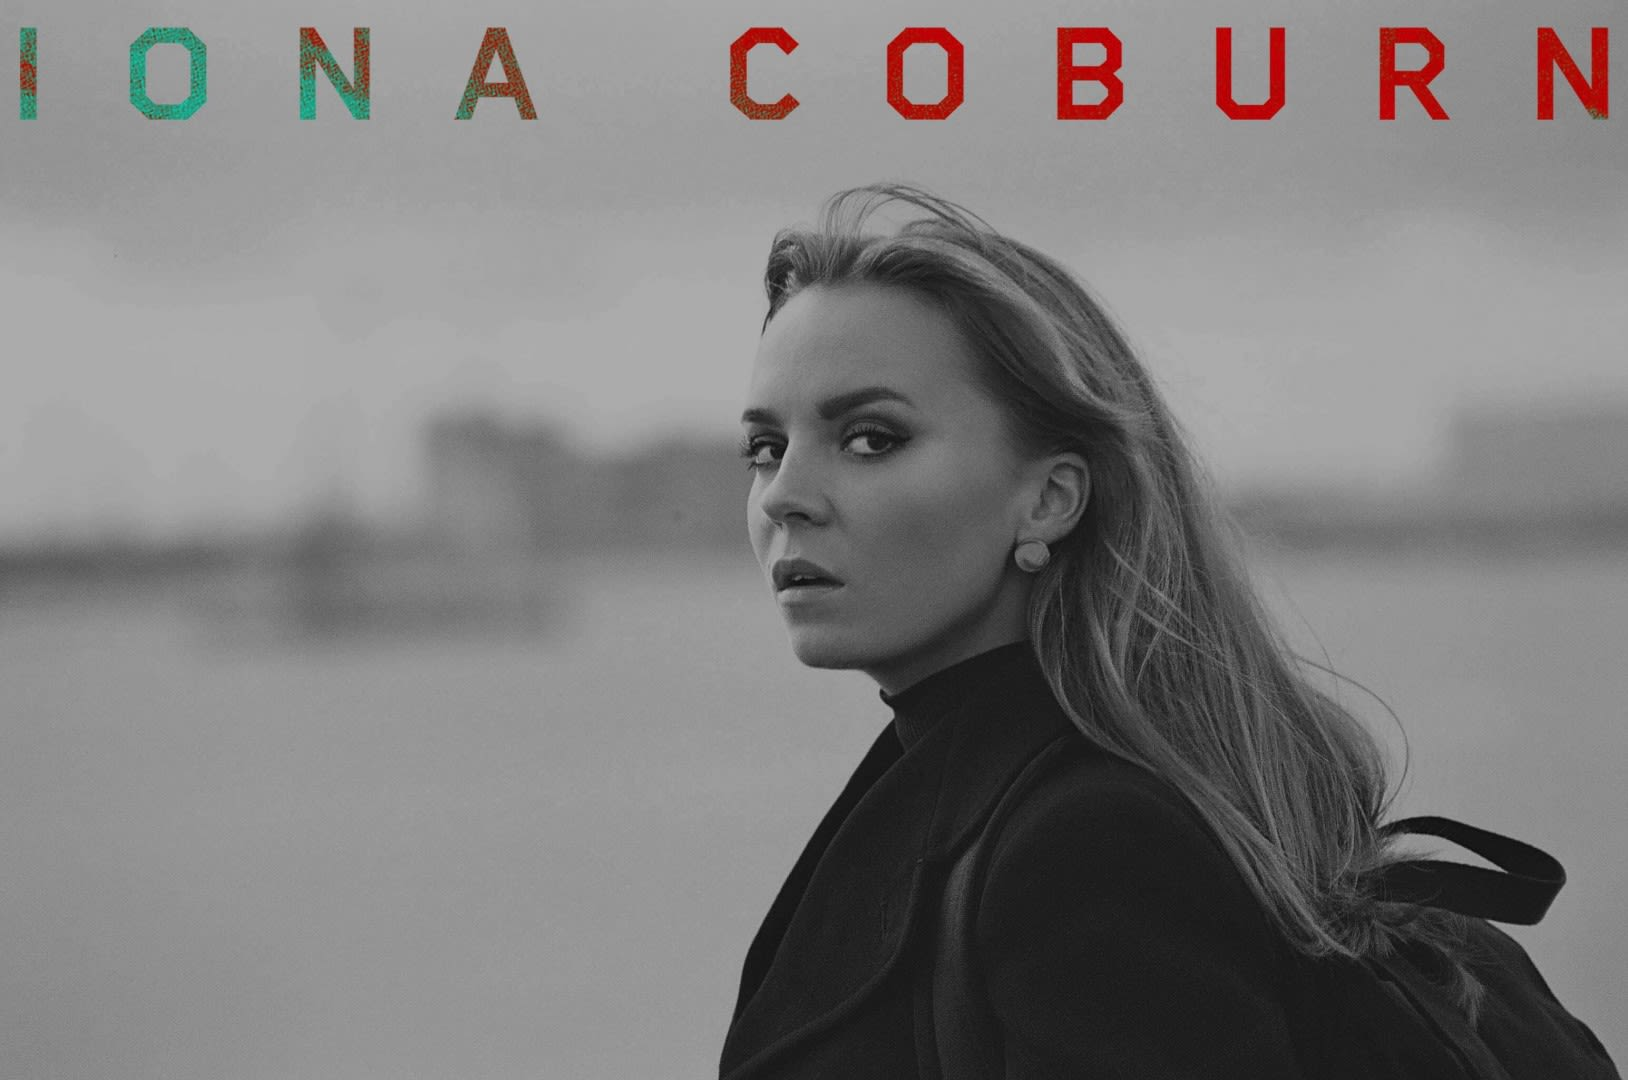 Iona Coburn Header Image Monochrome